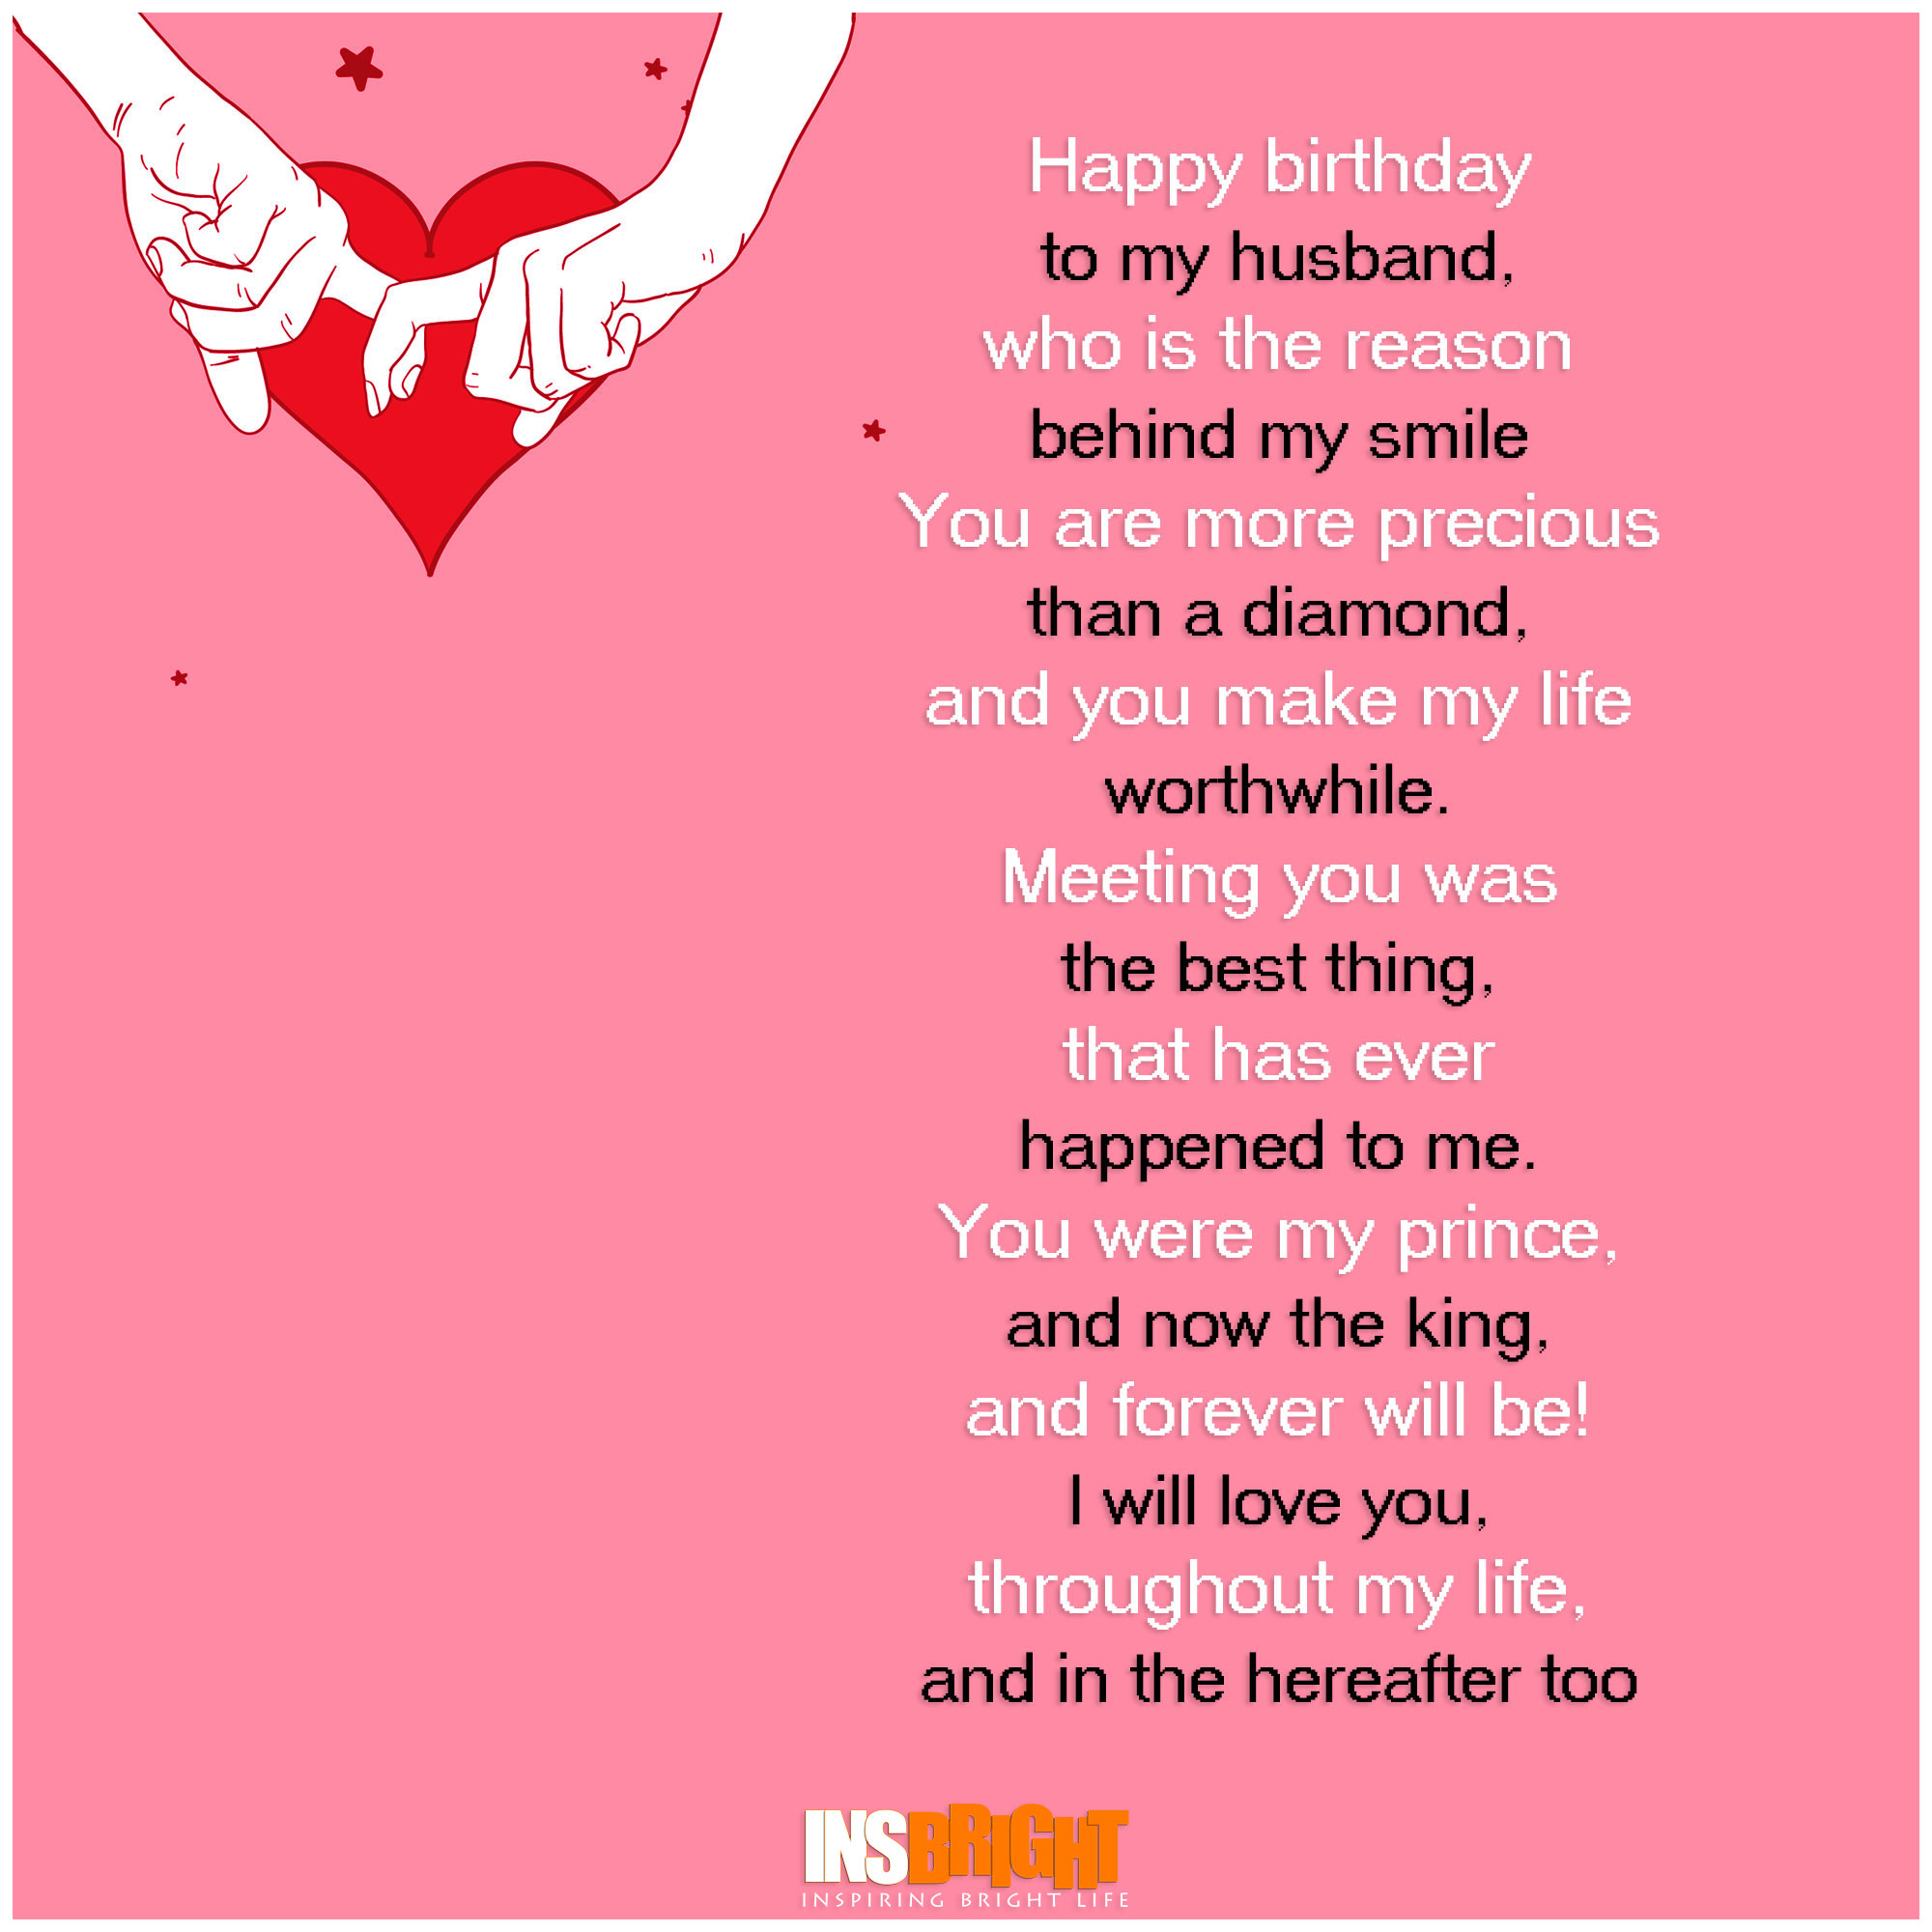 Cute birthday poem